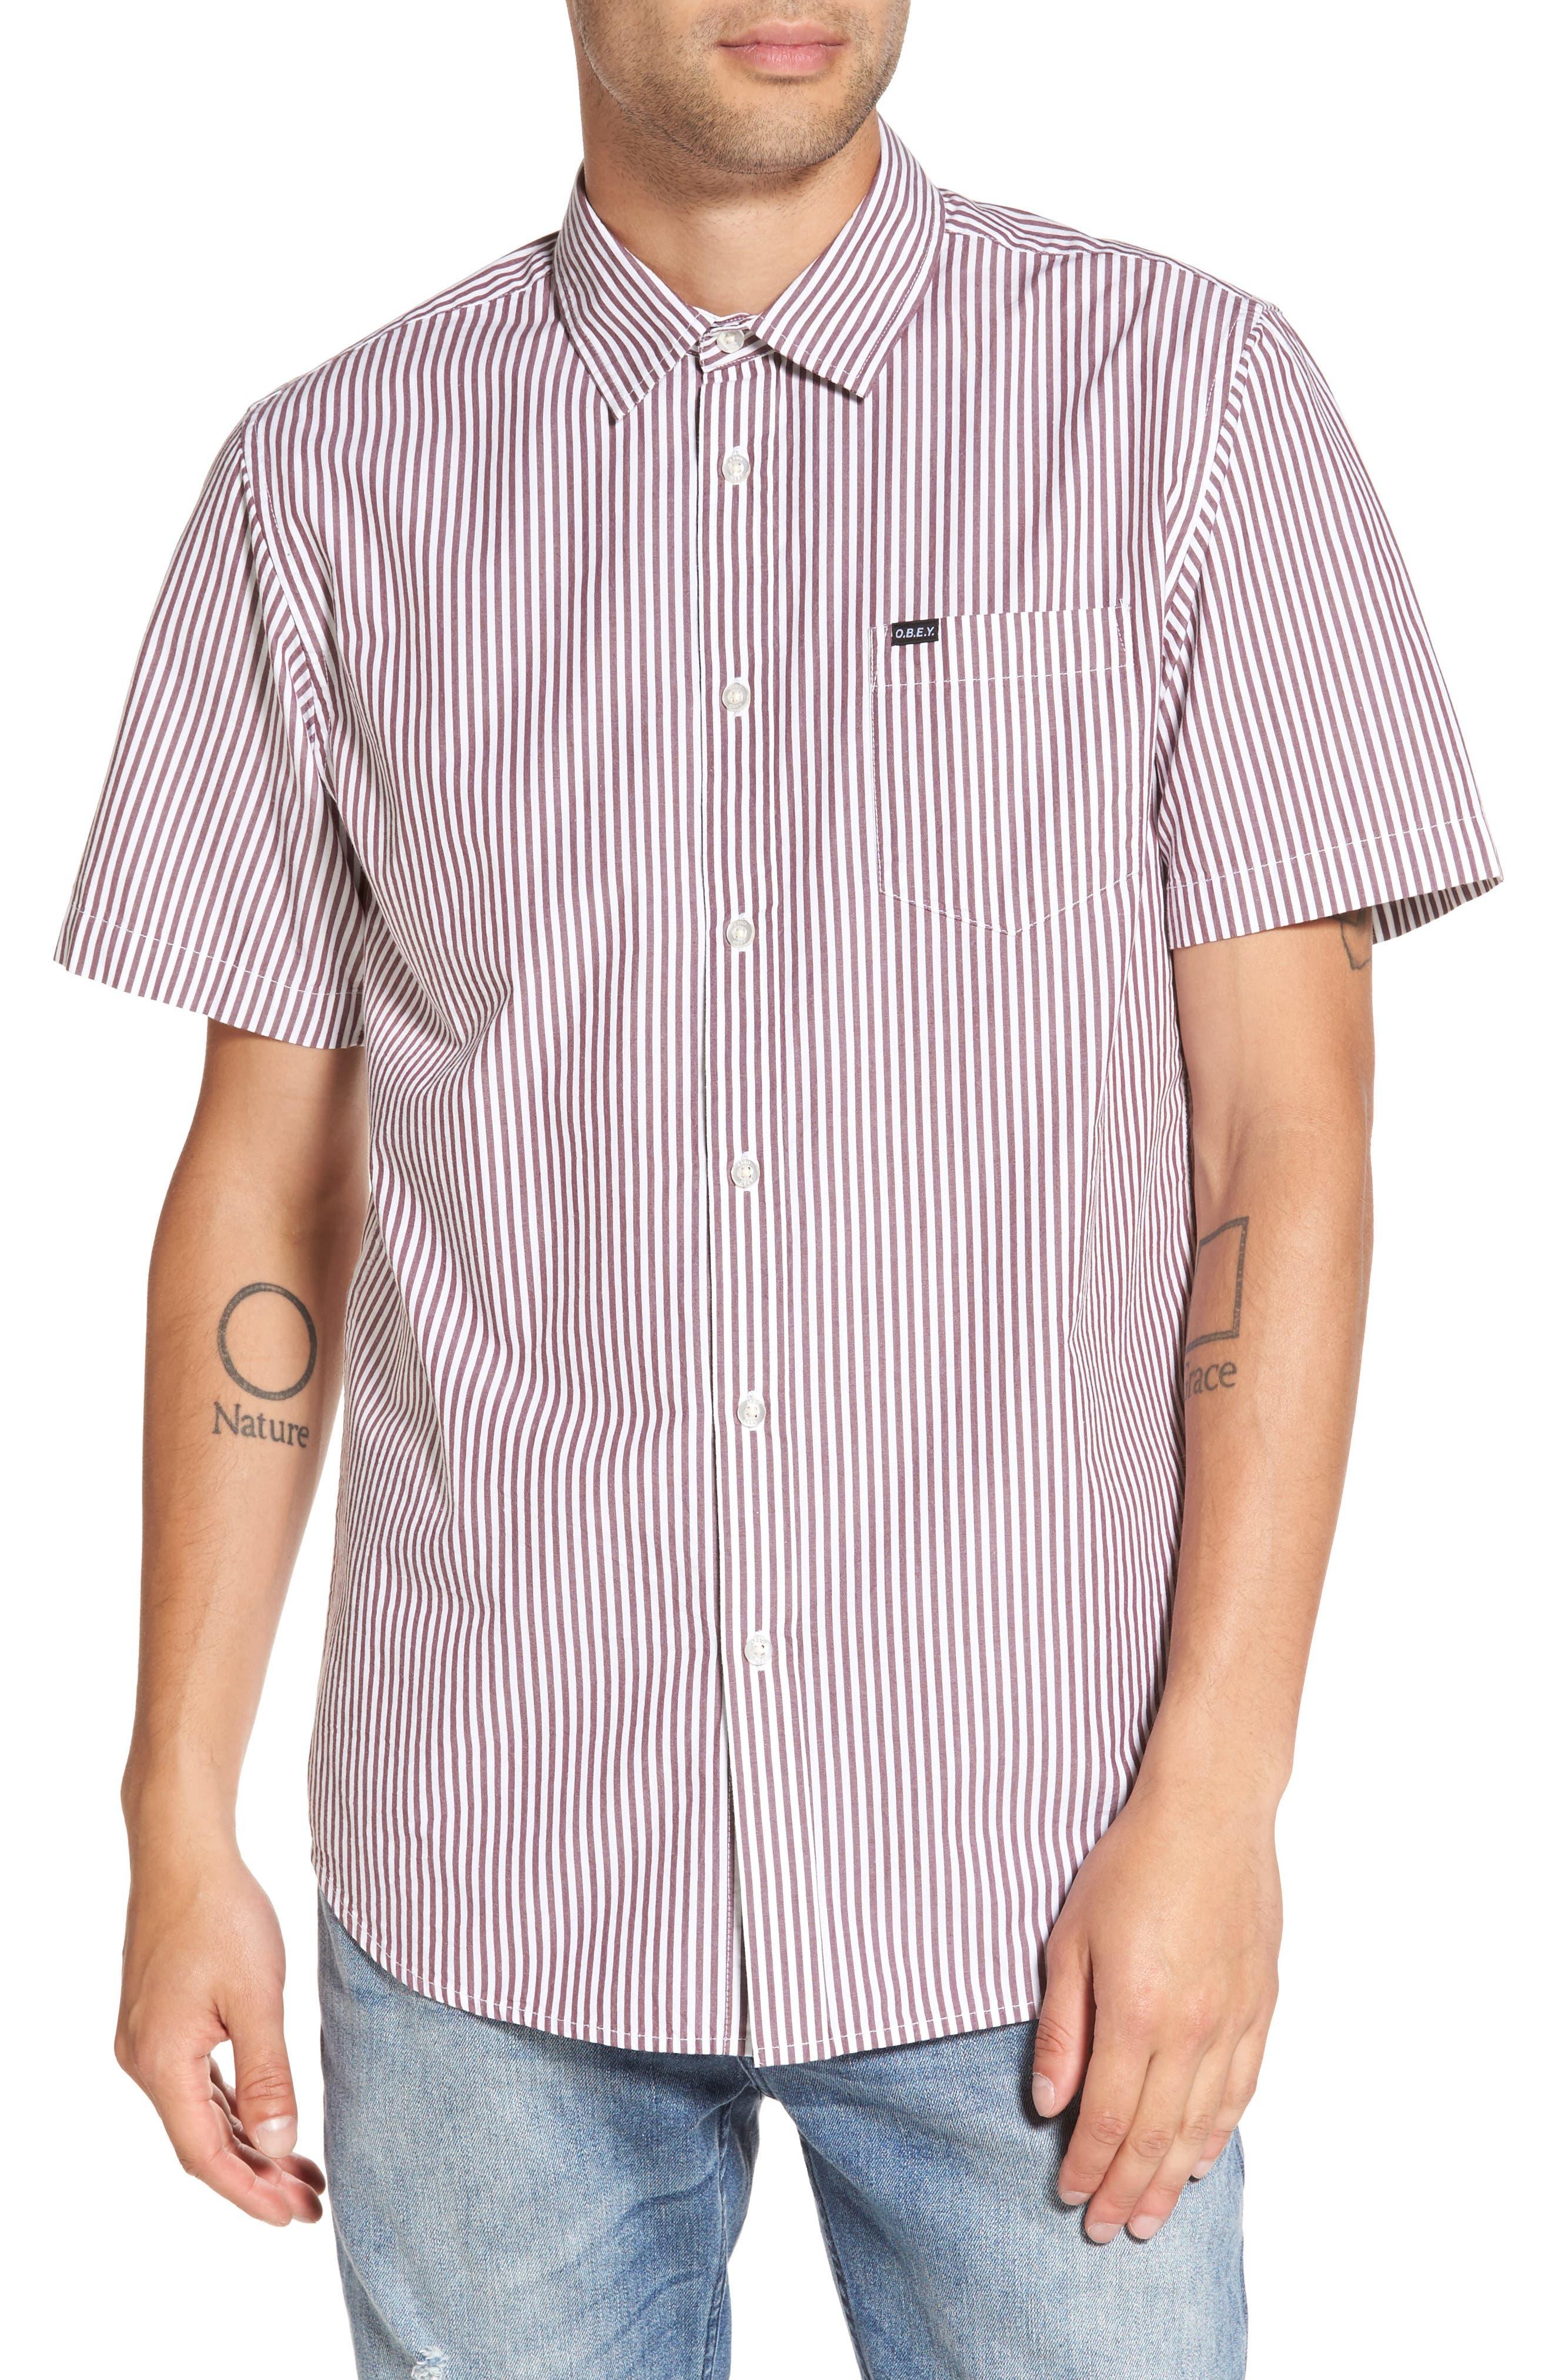 Adario Stripe Woven Shirt,                         Main,                         color, Eggplant